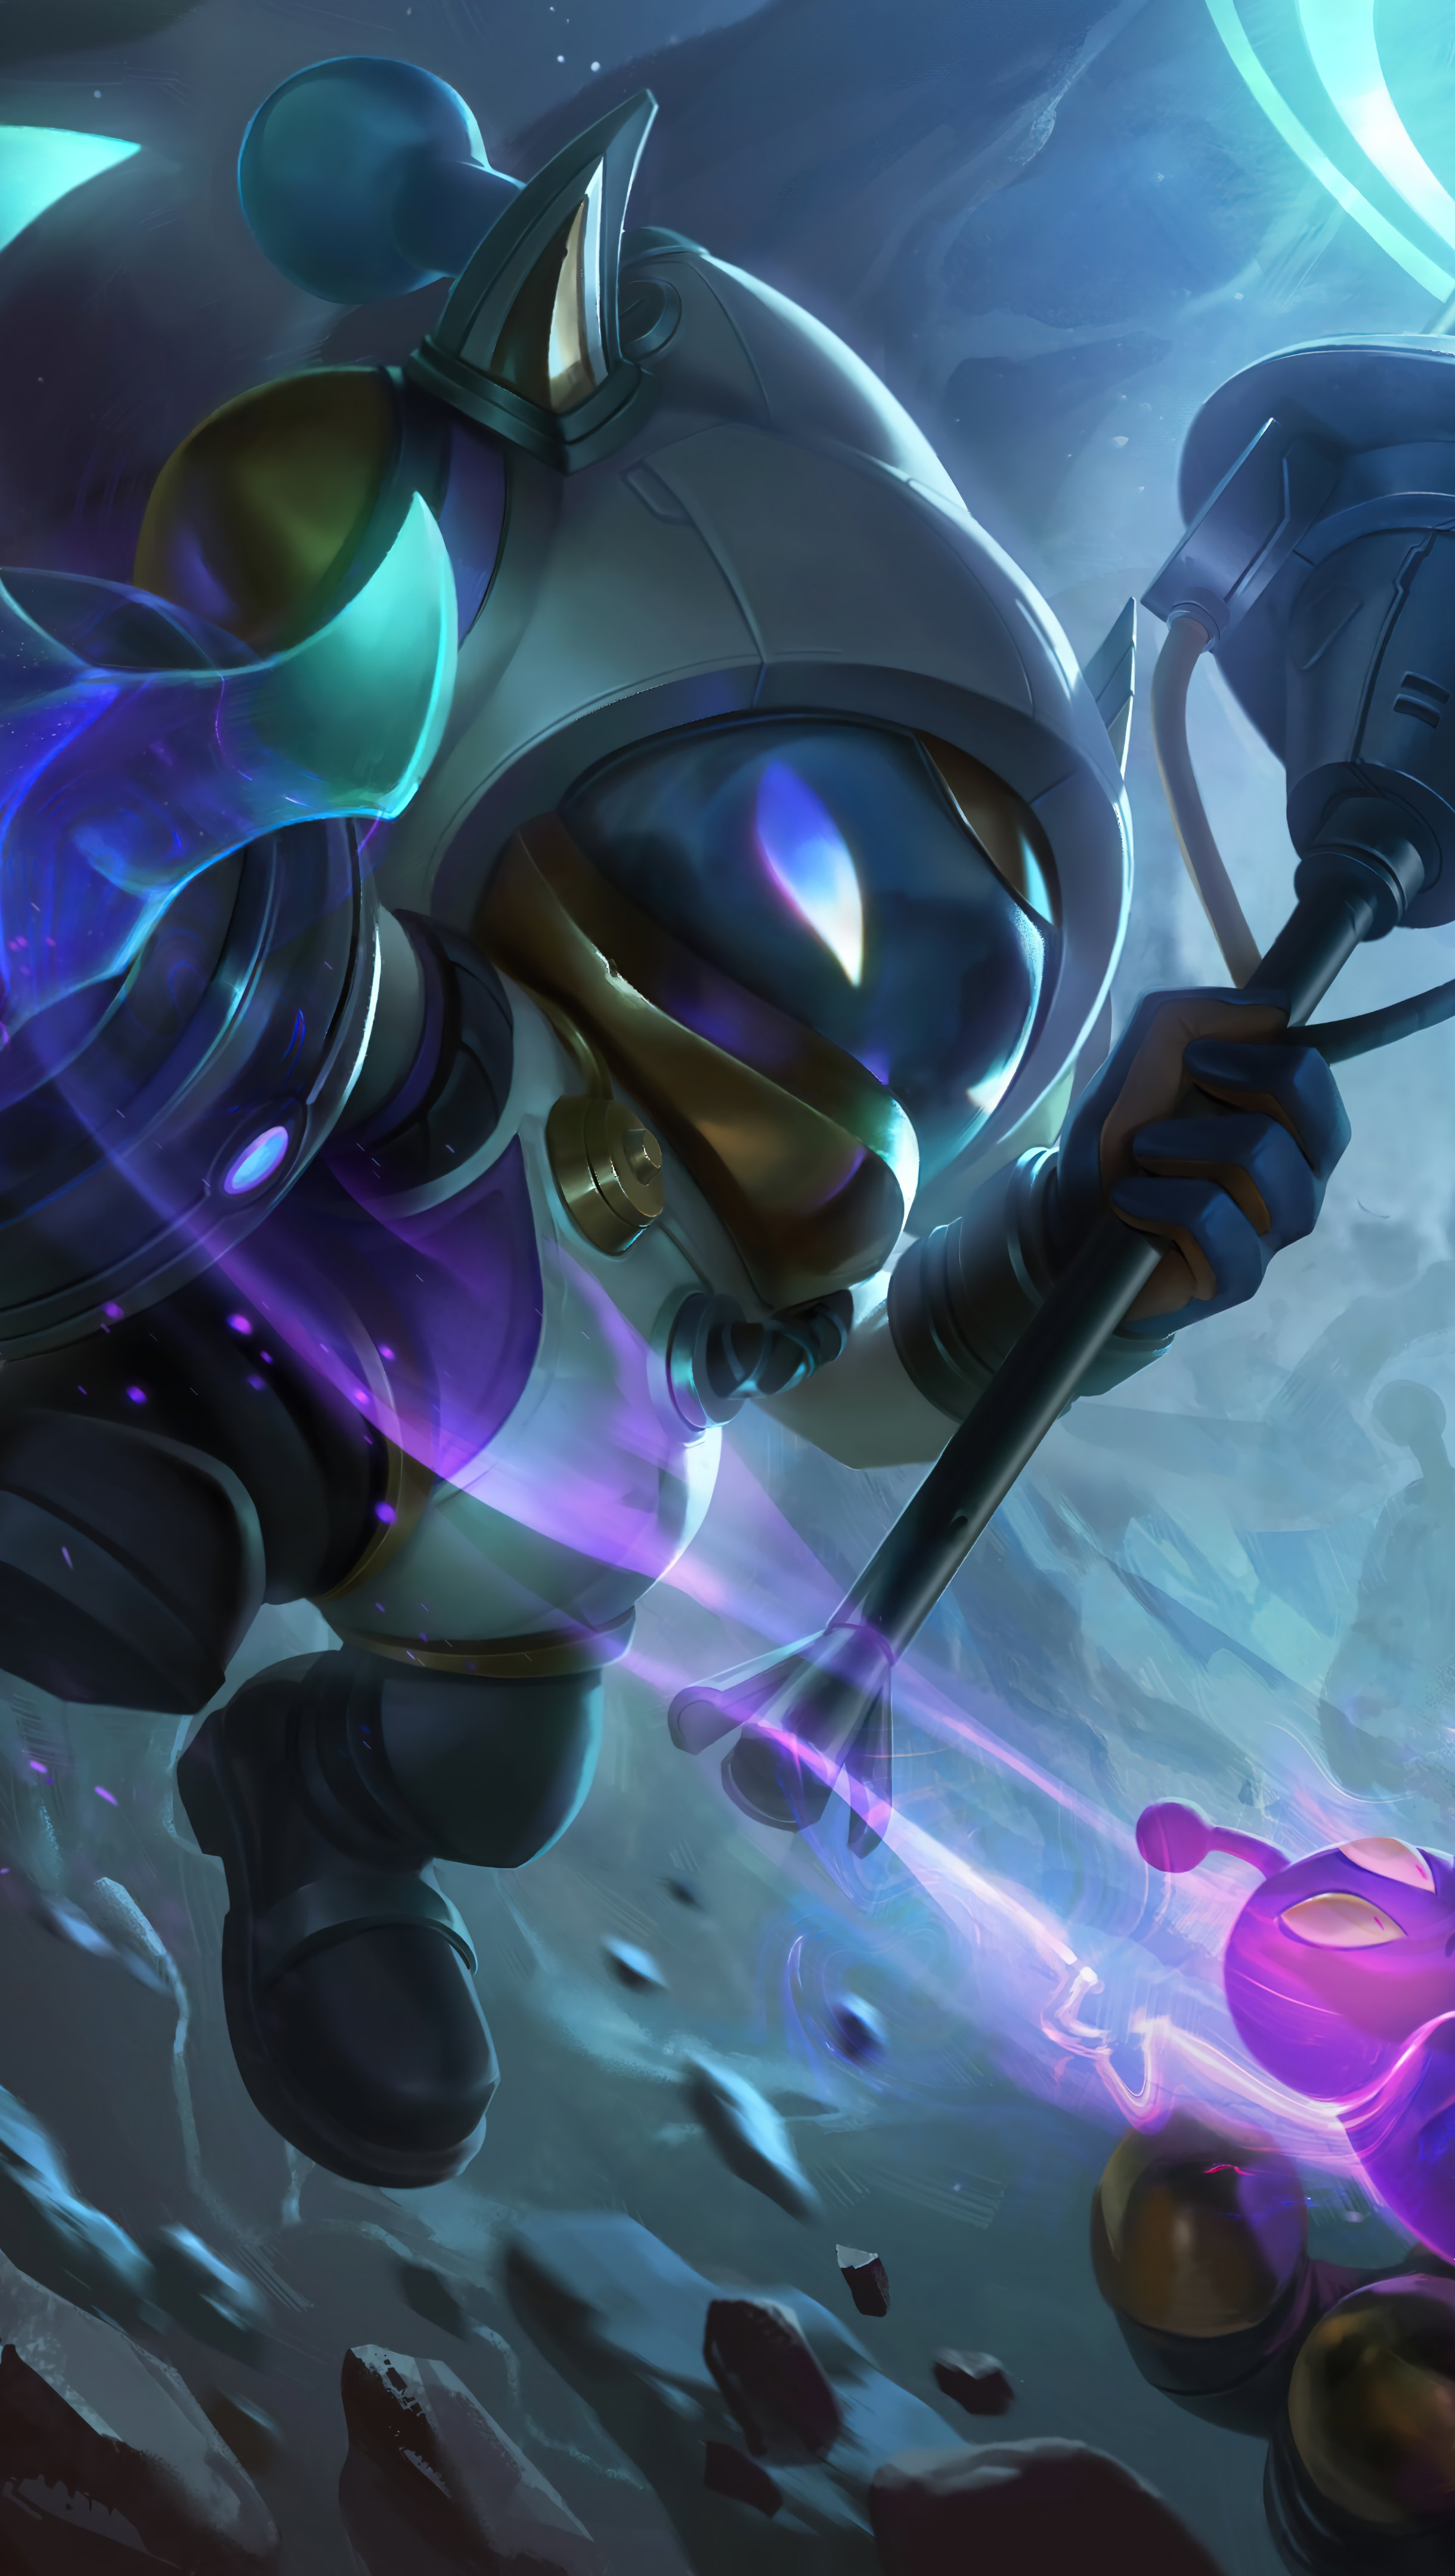 Fondos de pantalla Astronauta Veigar y Rammus League of Legends Splash Art Vertical